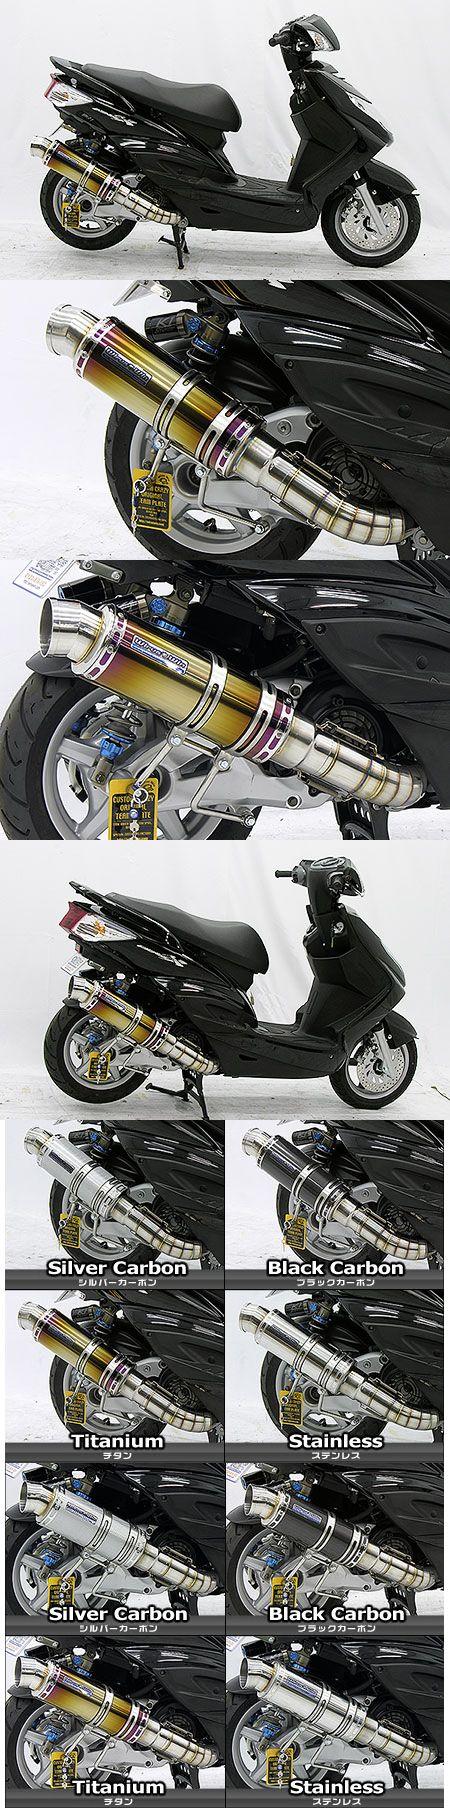 Premium全段排氣管 鈦合金款式